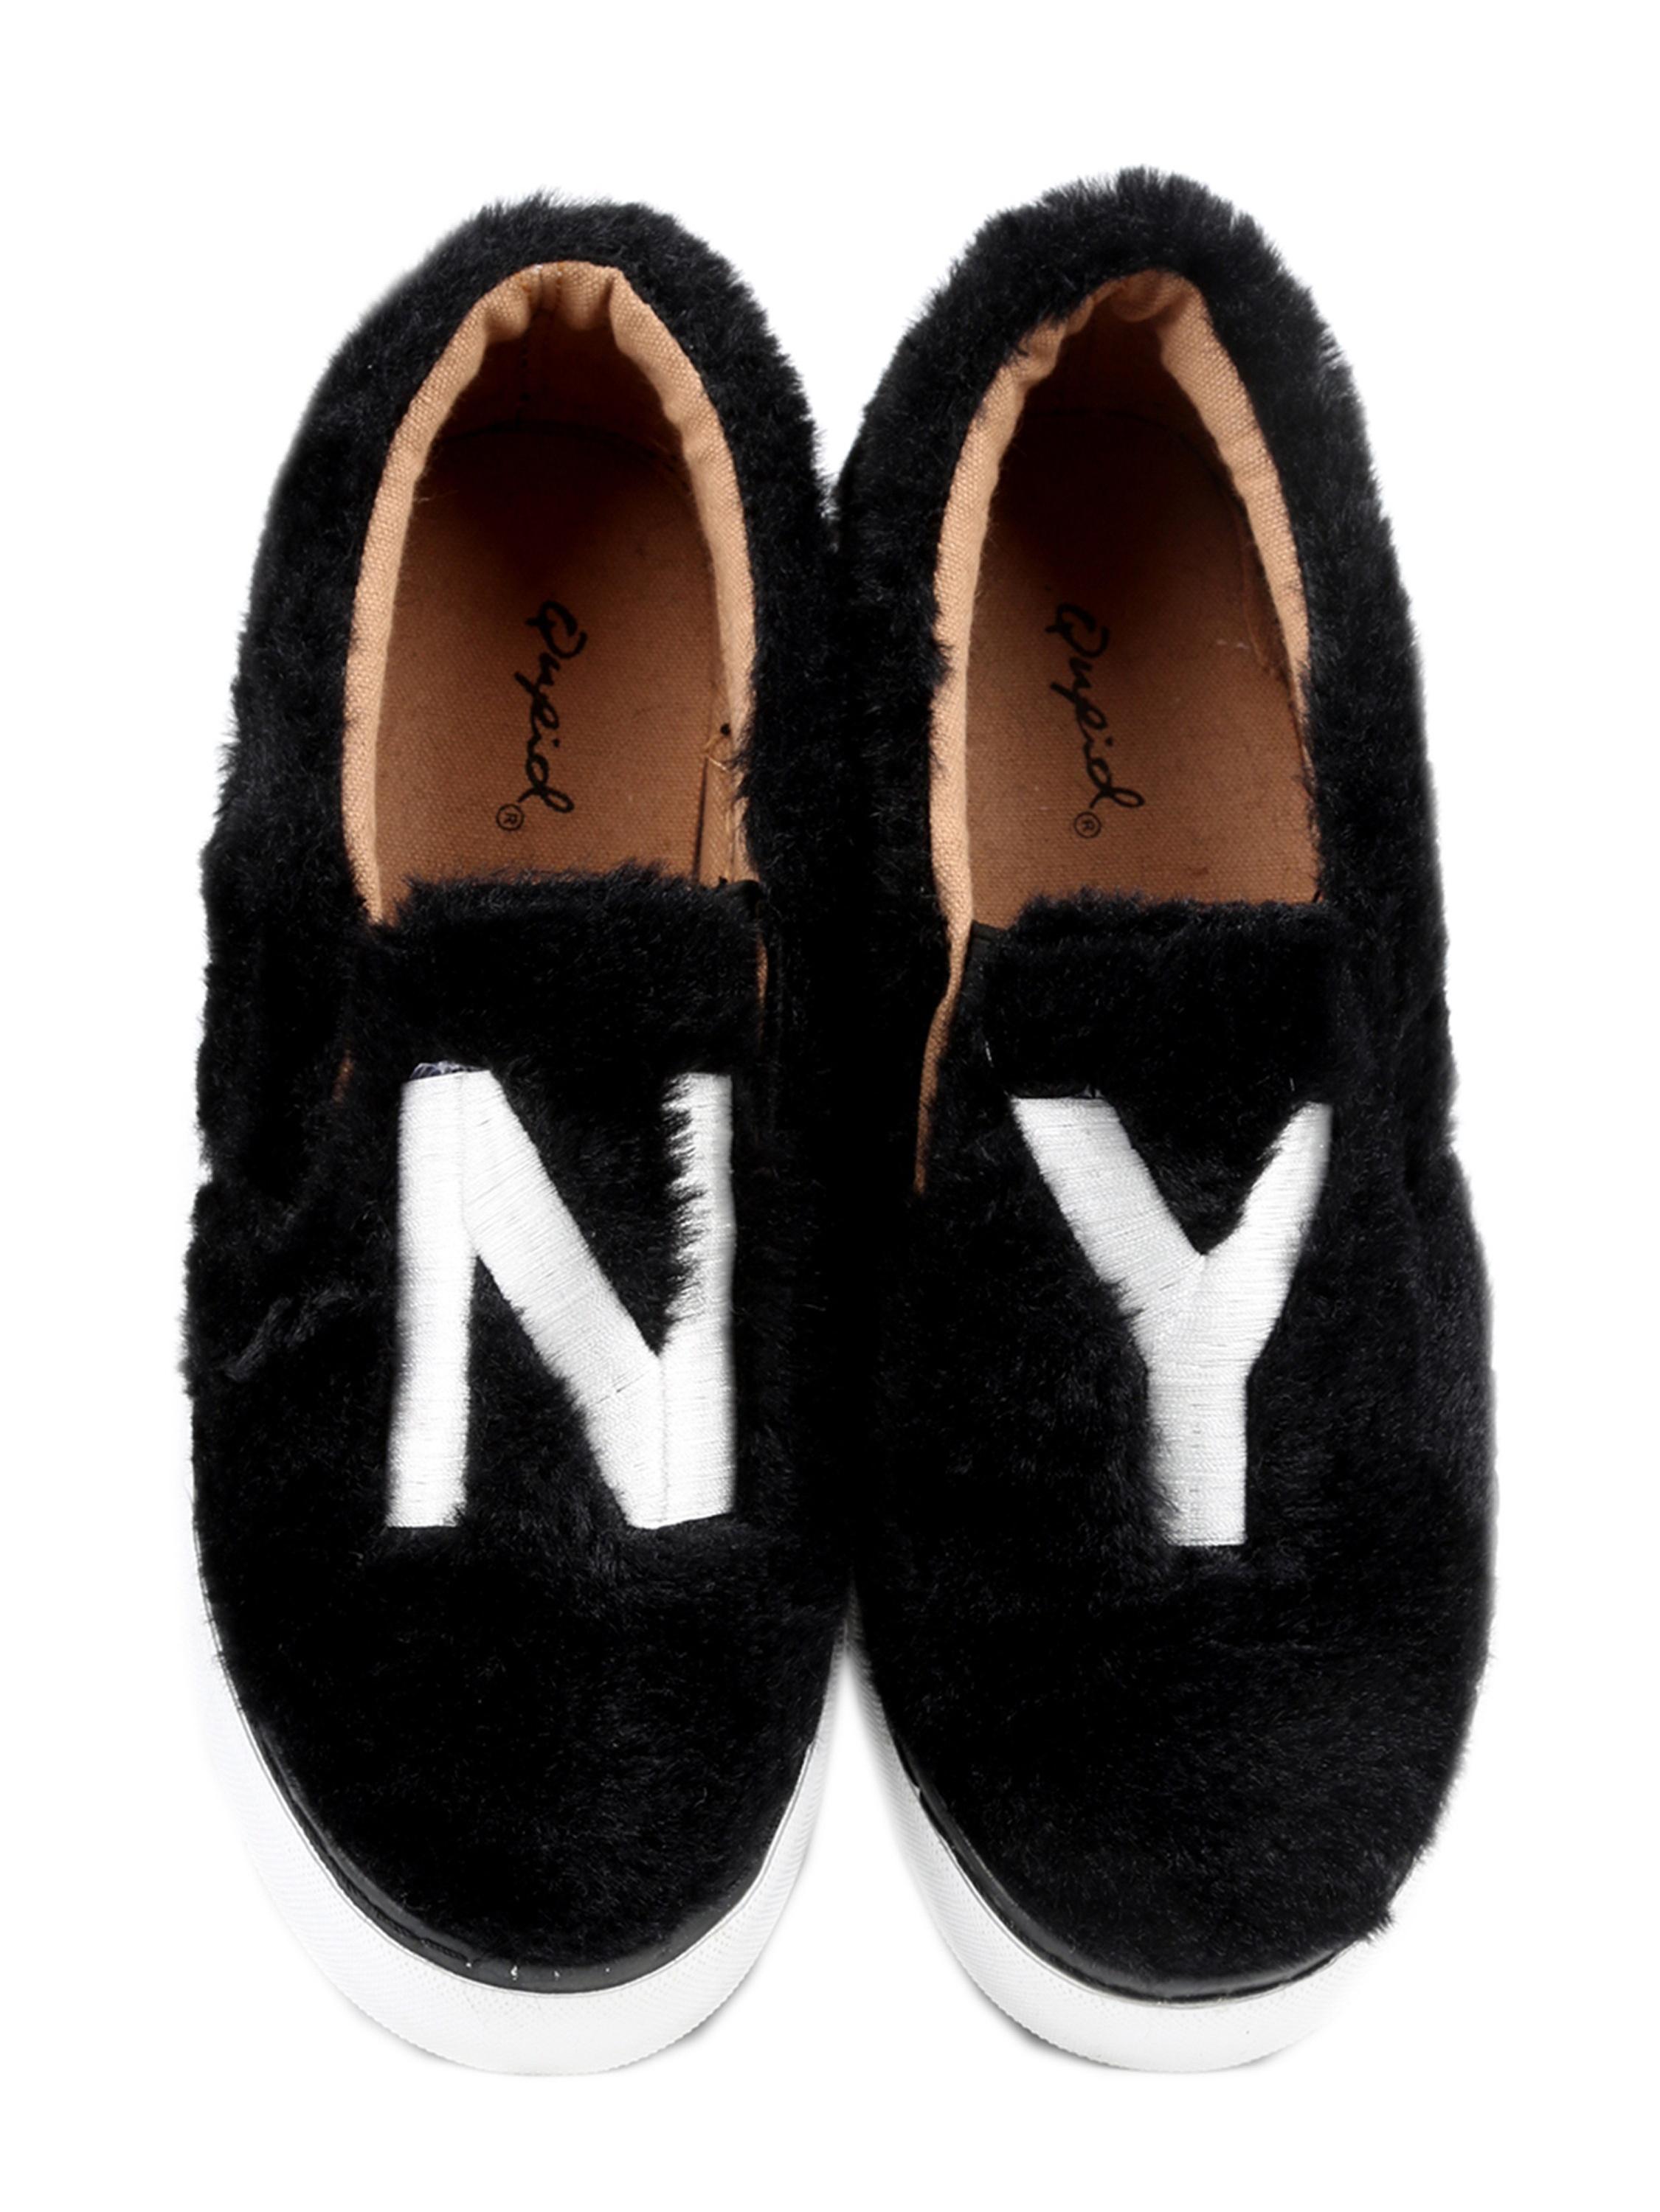 Xehar Women's Casual Fashion Fur Slip On Sneakers